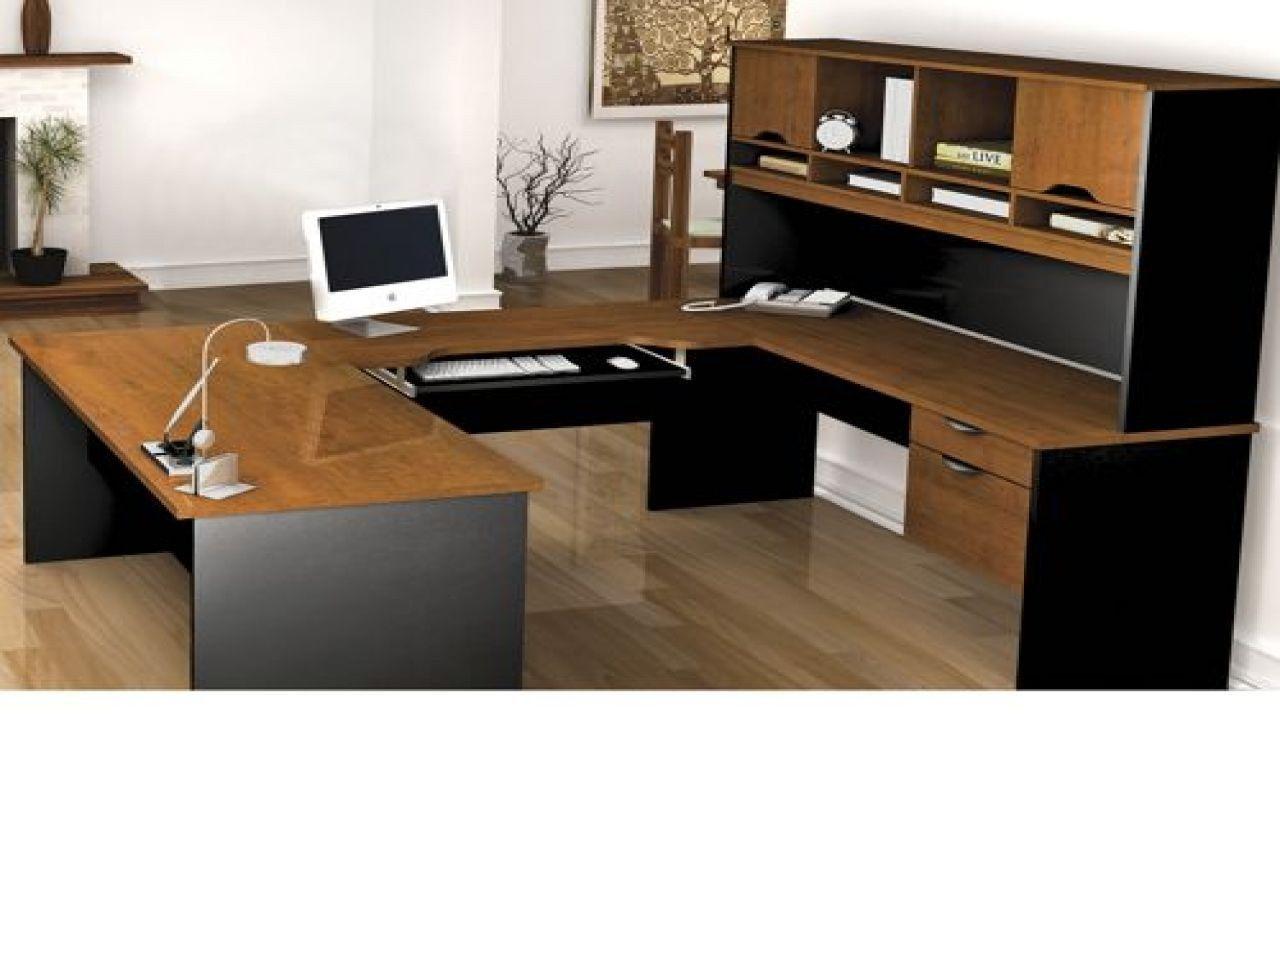 Costco Office Furniture Desk   Home Office Desk Furniture Check More At  Http://